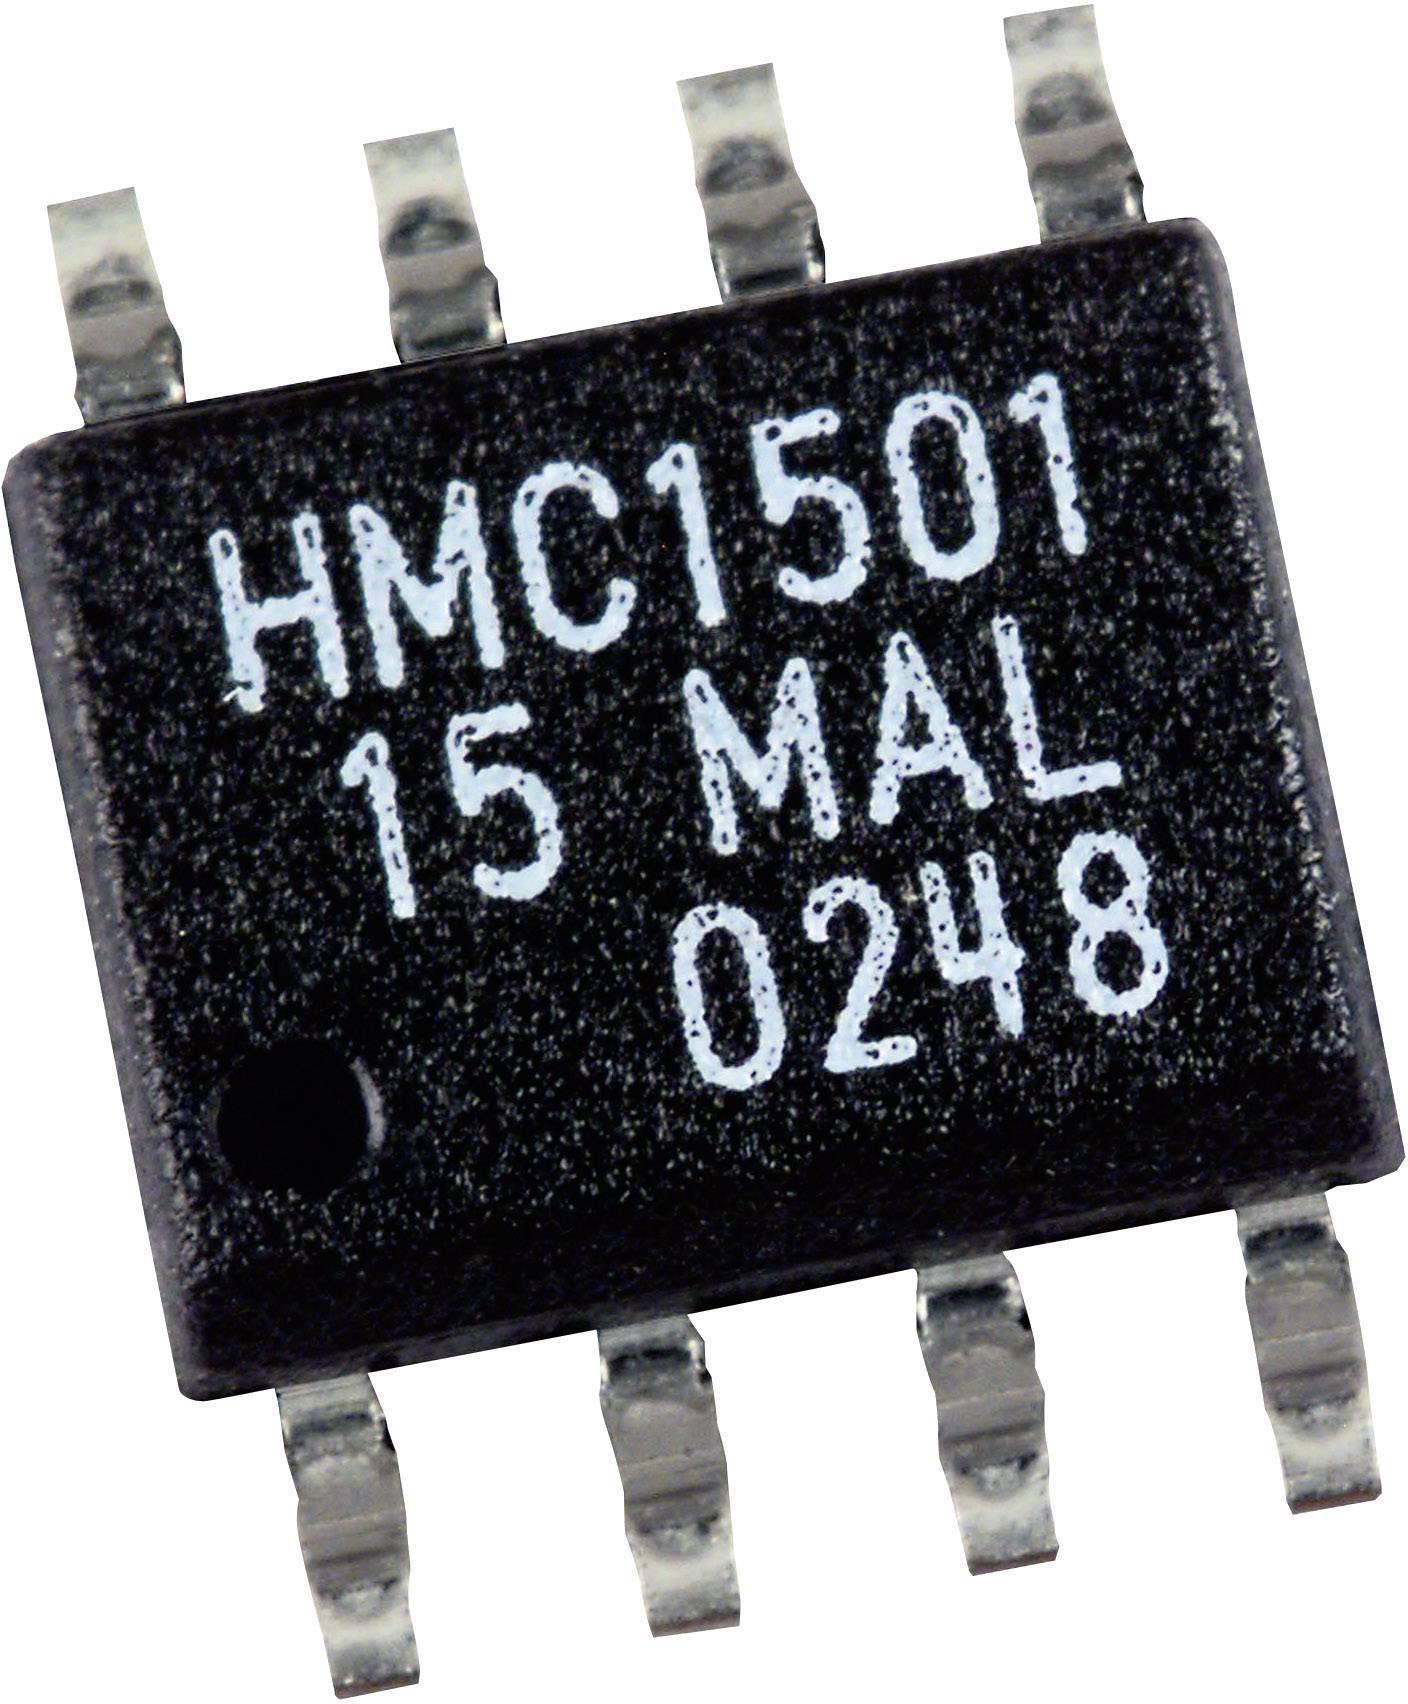 Magnetoresistivní senzor Honeywell HMC1021S, 5 - 25 V, SOIC 8